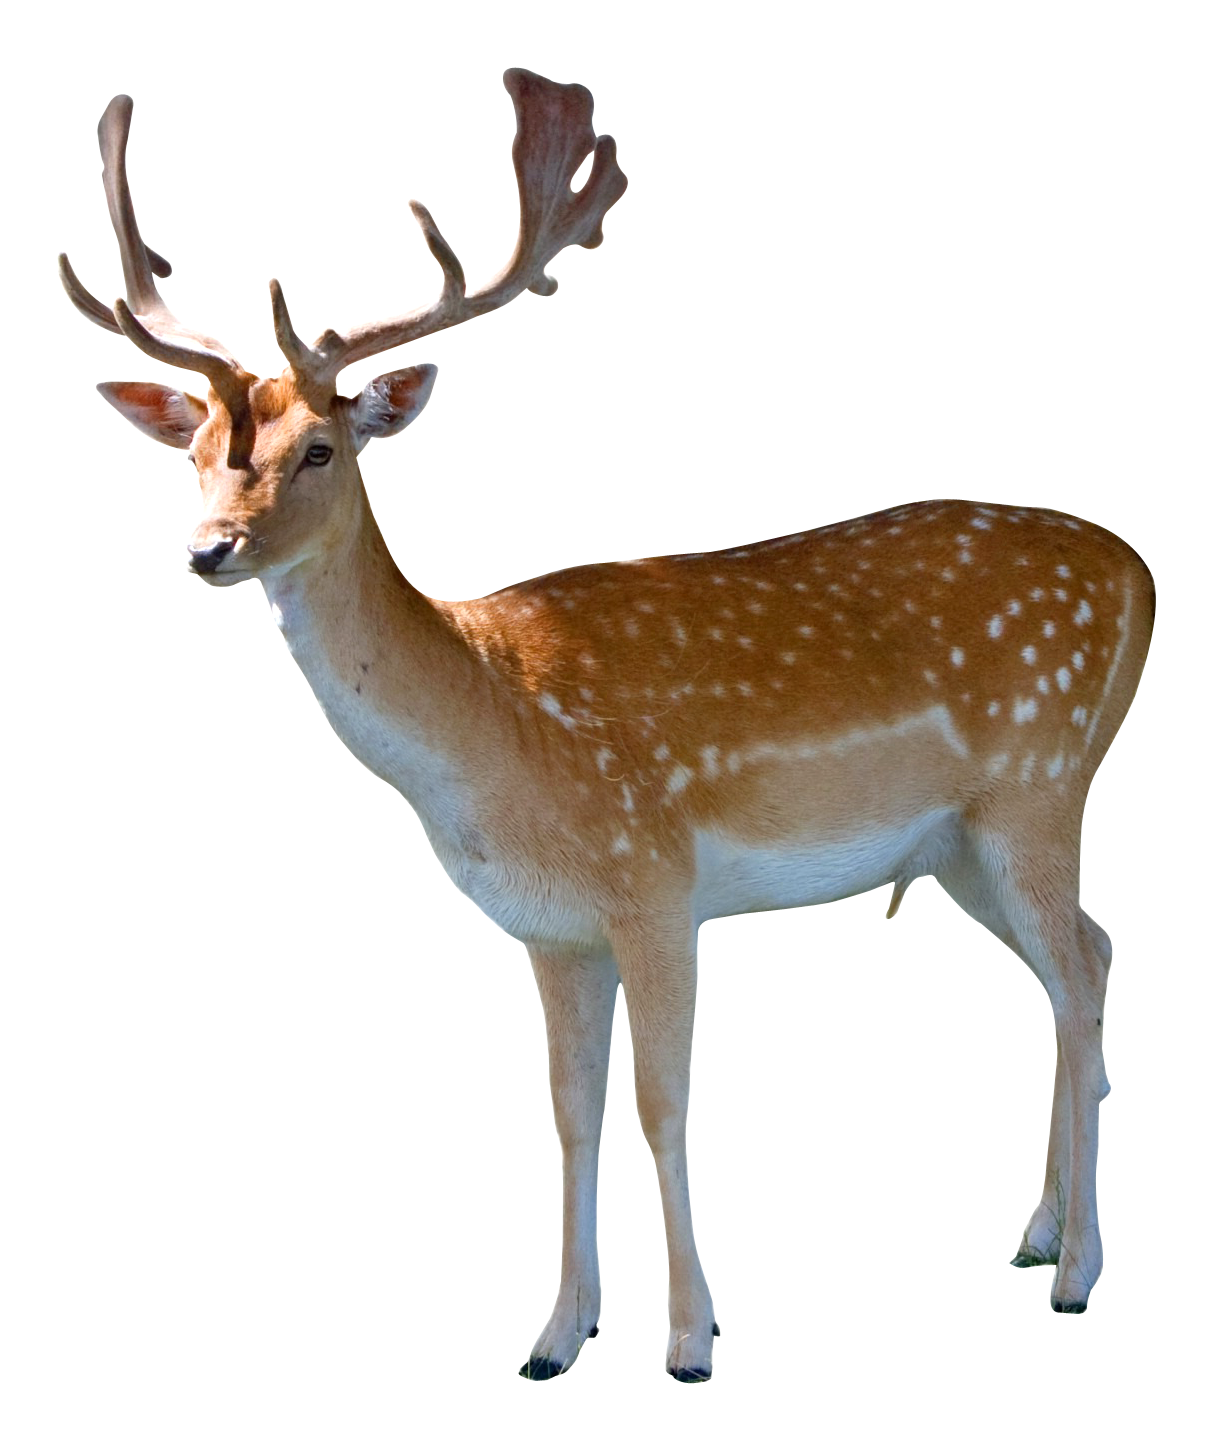 Deer Png Image Deer Animals Png